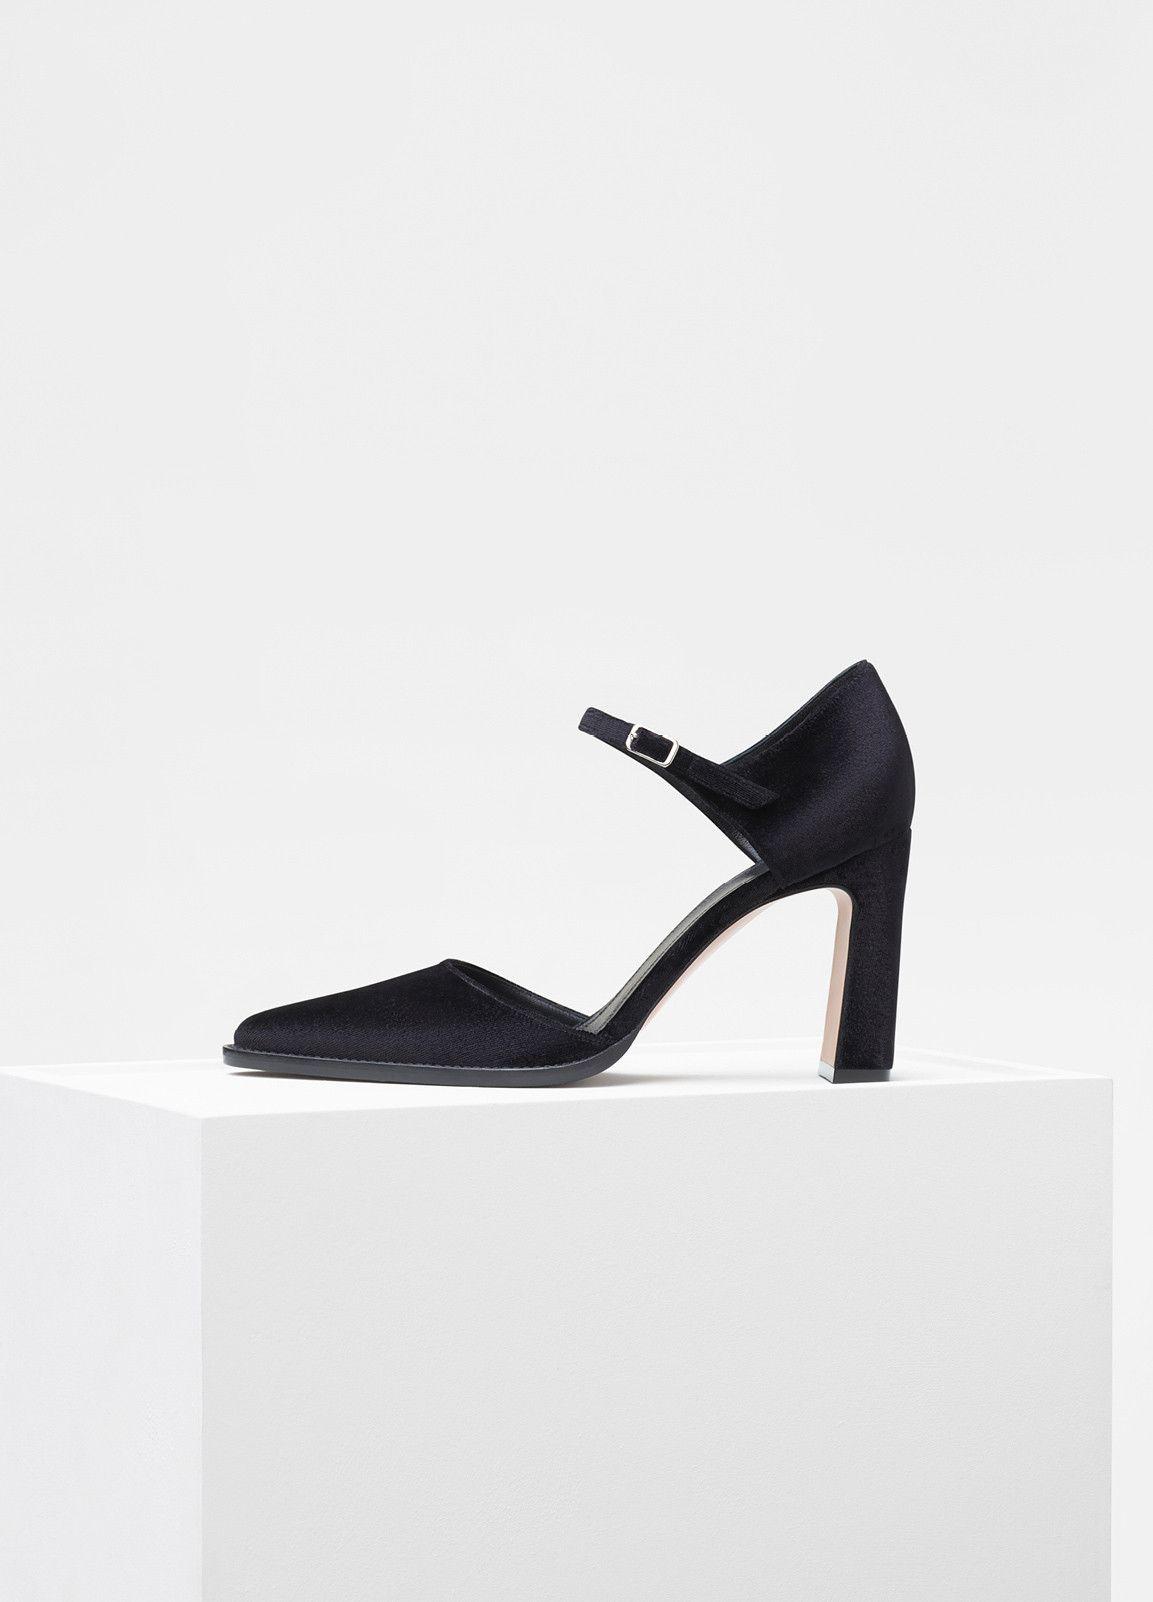 1d2050a8031c New Straight Heel Pump in Velvet - Céline